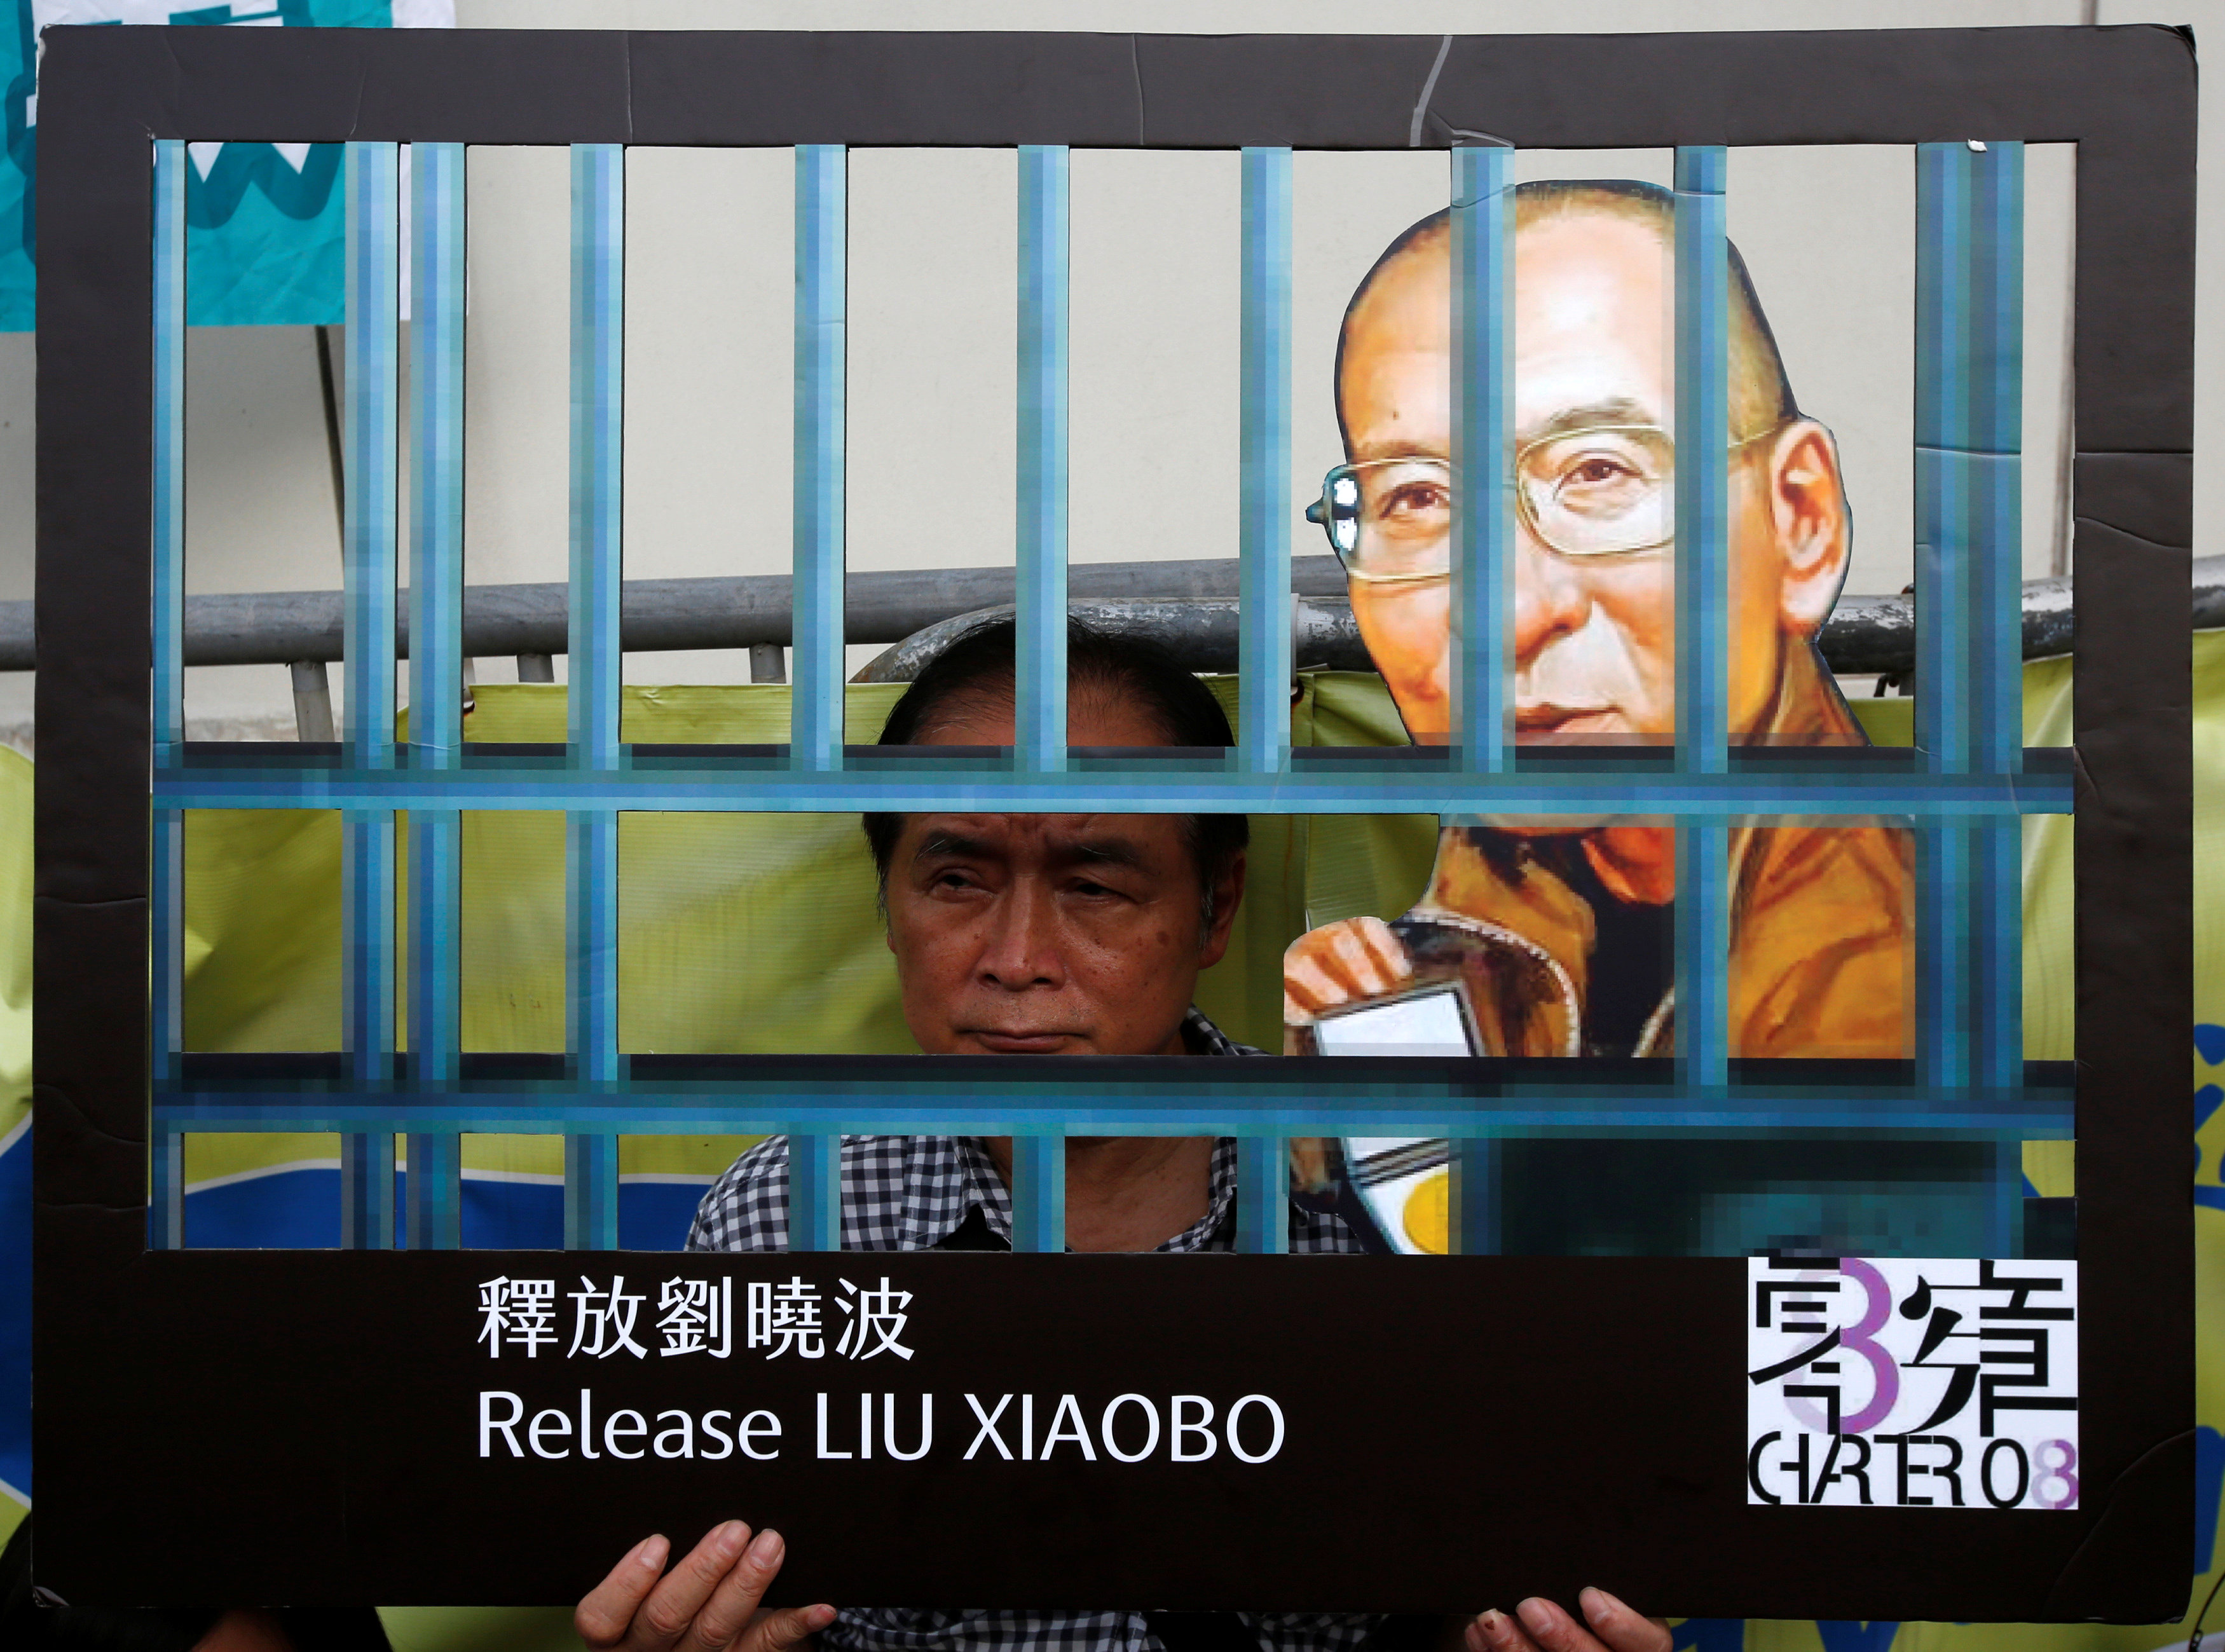 Ailing China dissident Liu still getting emergency treatment, says hospital